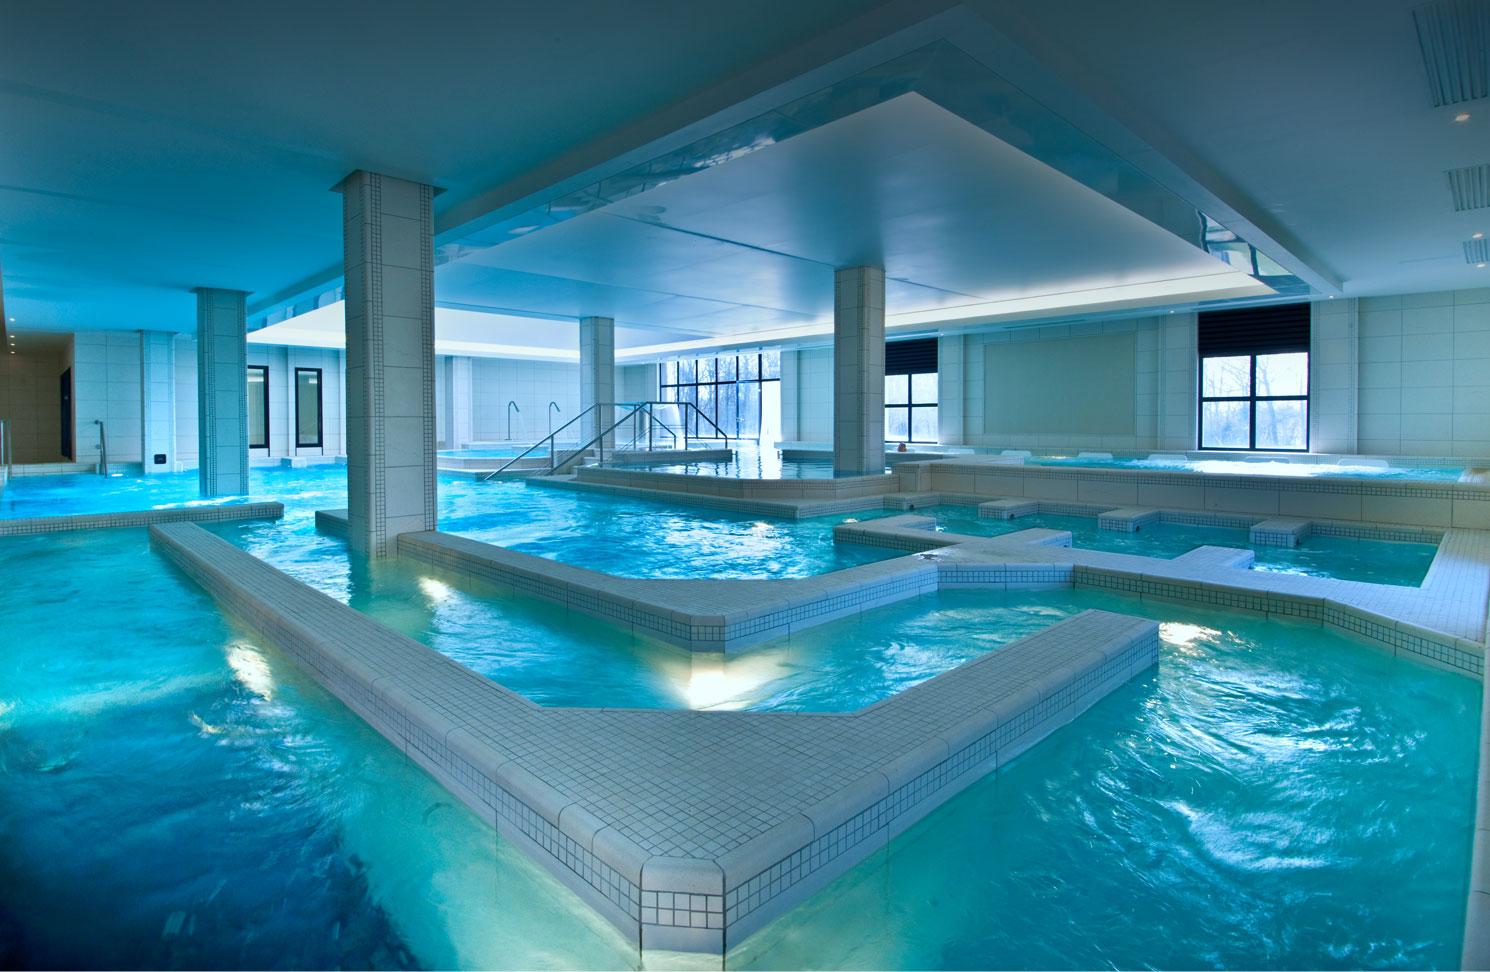 Thalasso Spa Treatments Thermes Marins Spa Aquatonic